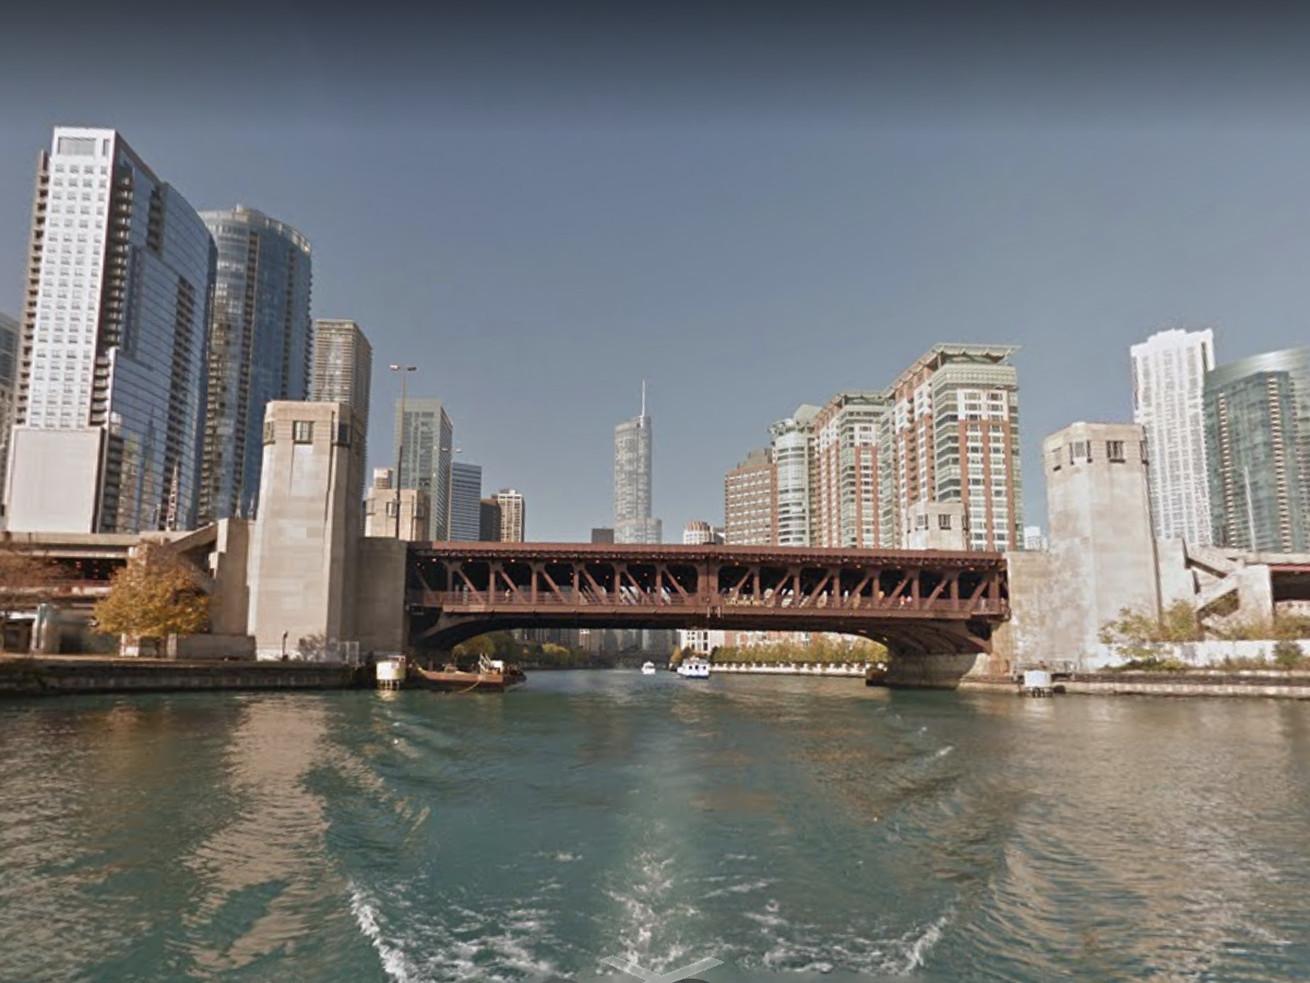 The Lake Shore Drive Bridge over the Chicago River